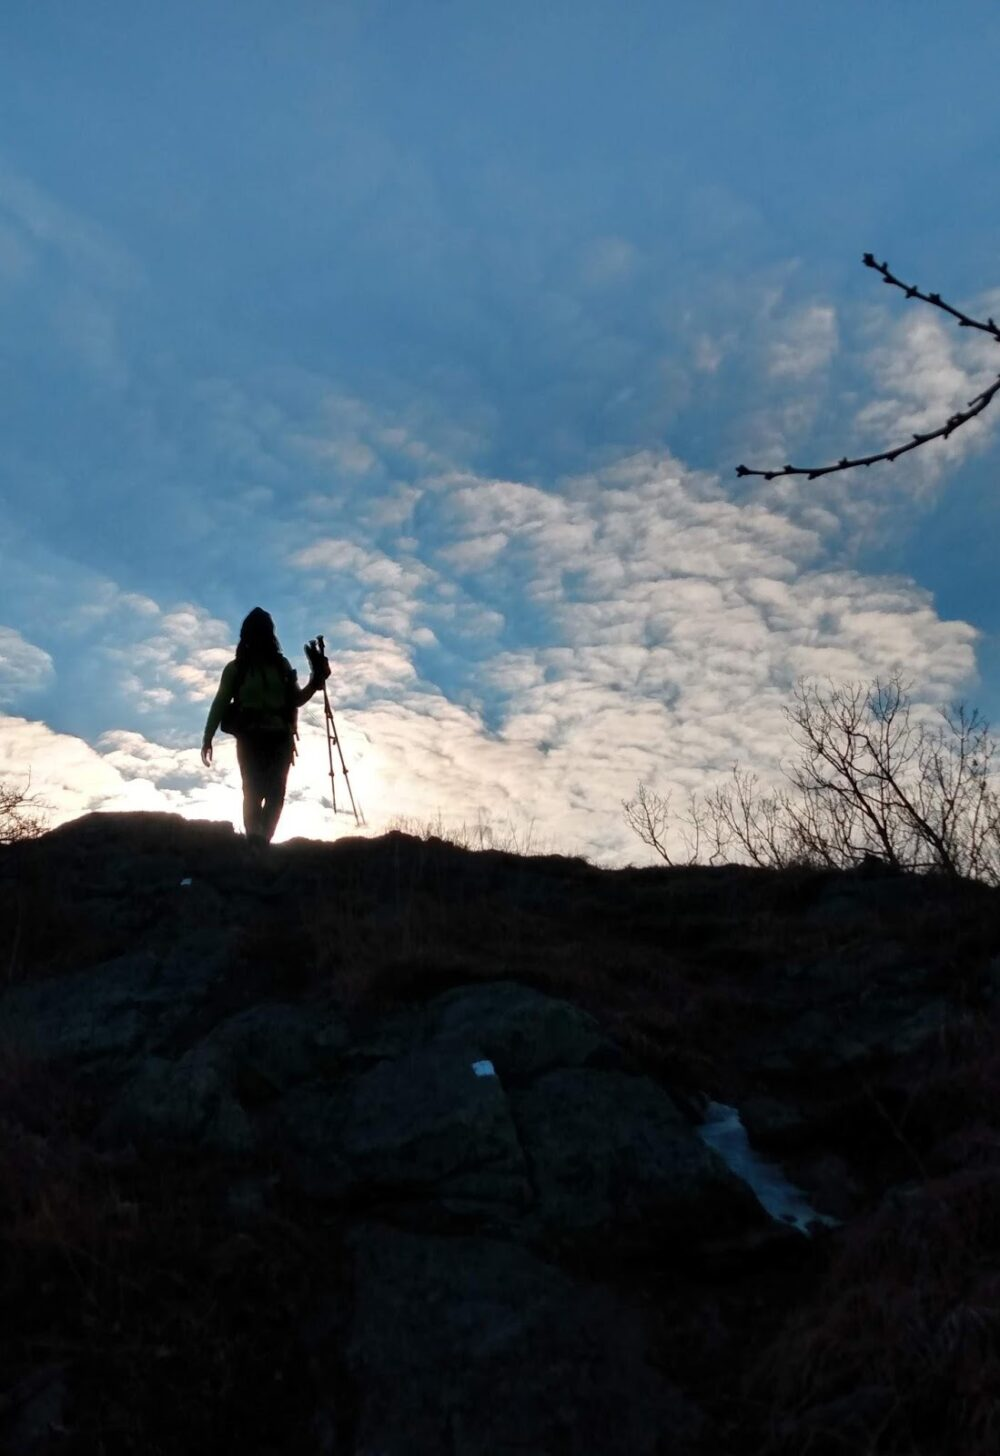 A woman with trekking poles walking on a ridge.